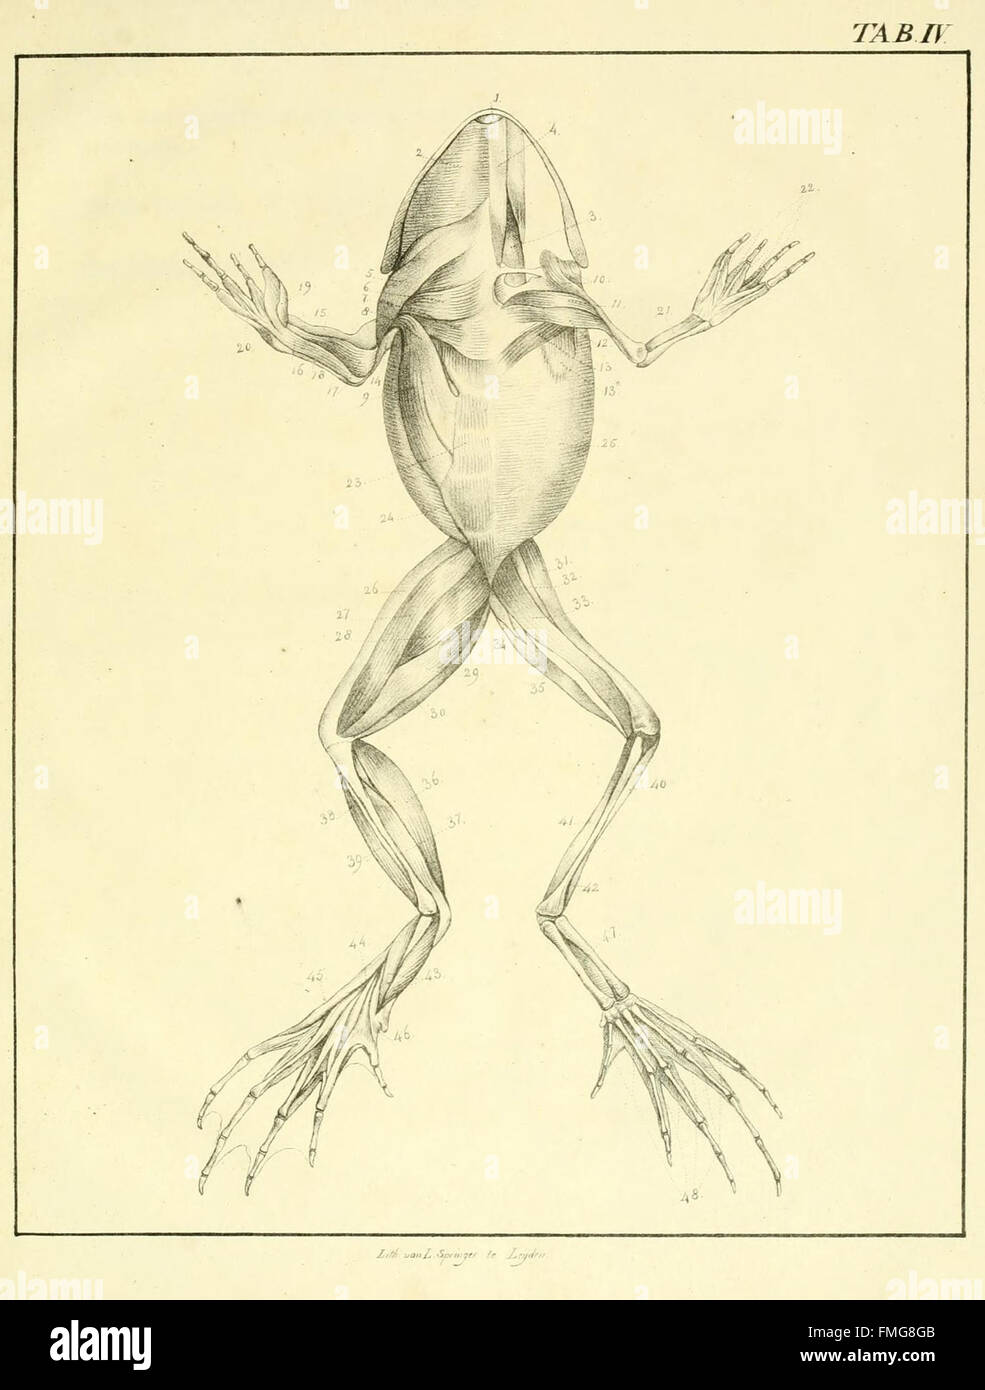 Amphibians Anatomy Harvard University Stock Photos & Amphibians ...